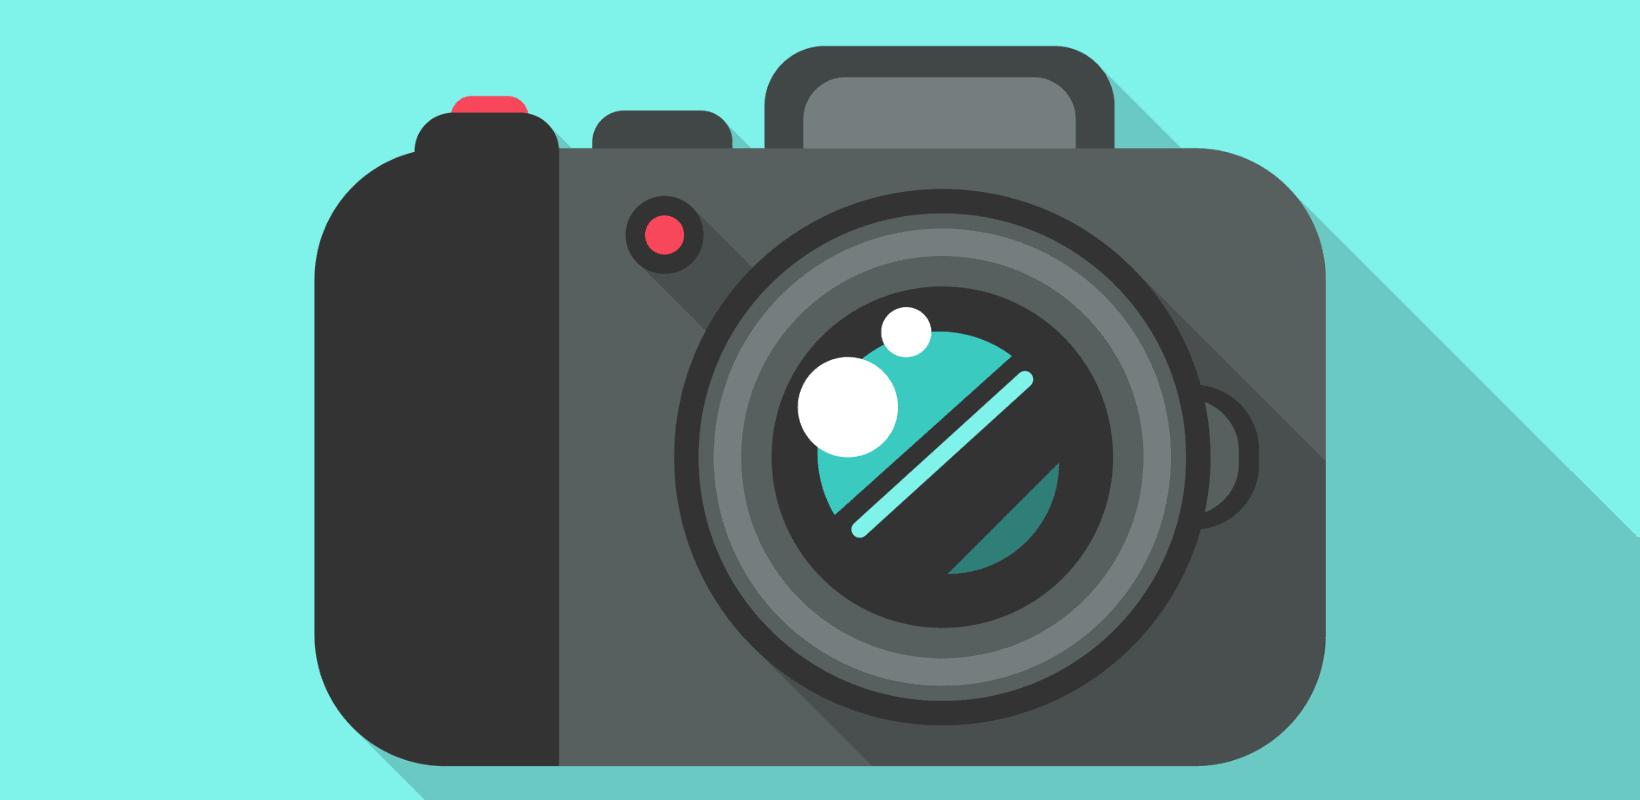 a handheld camera